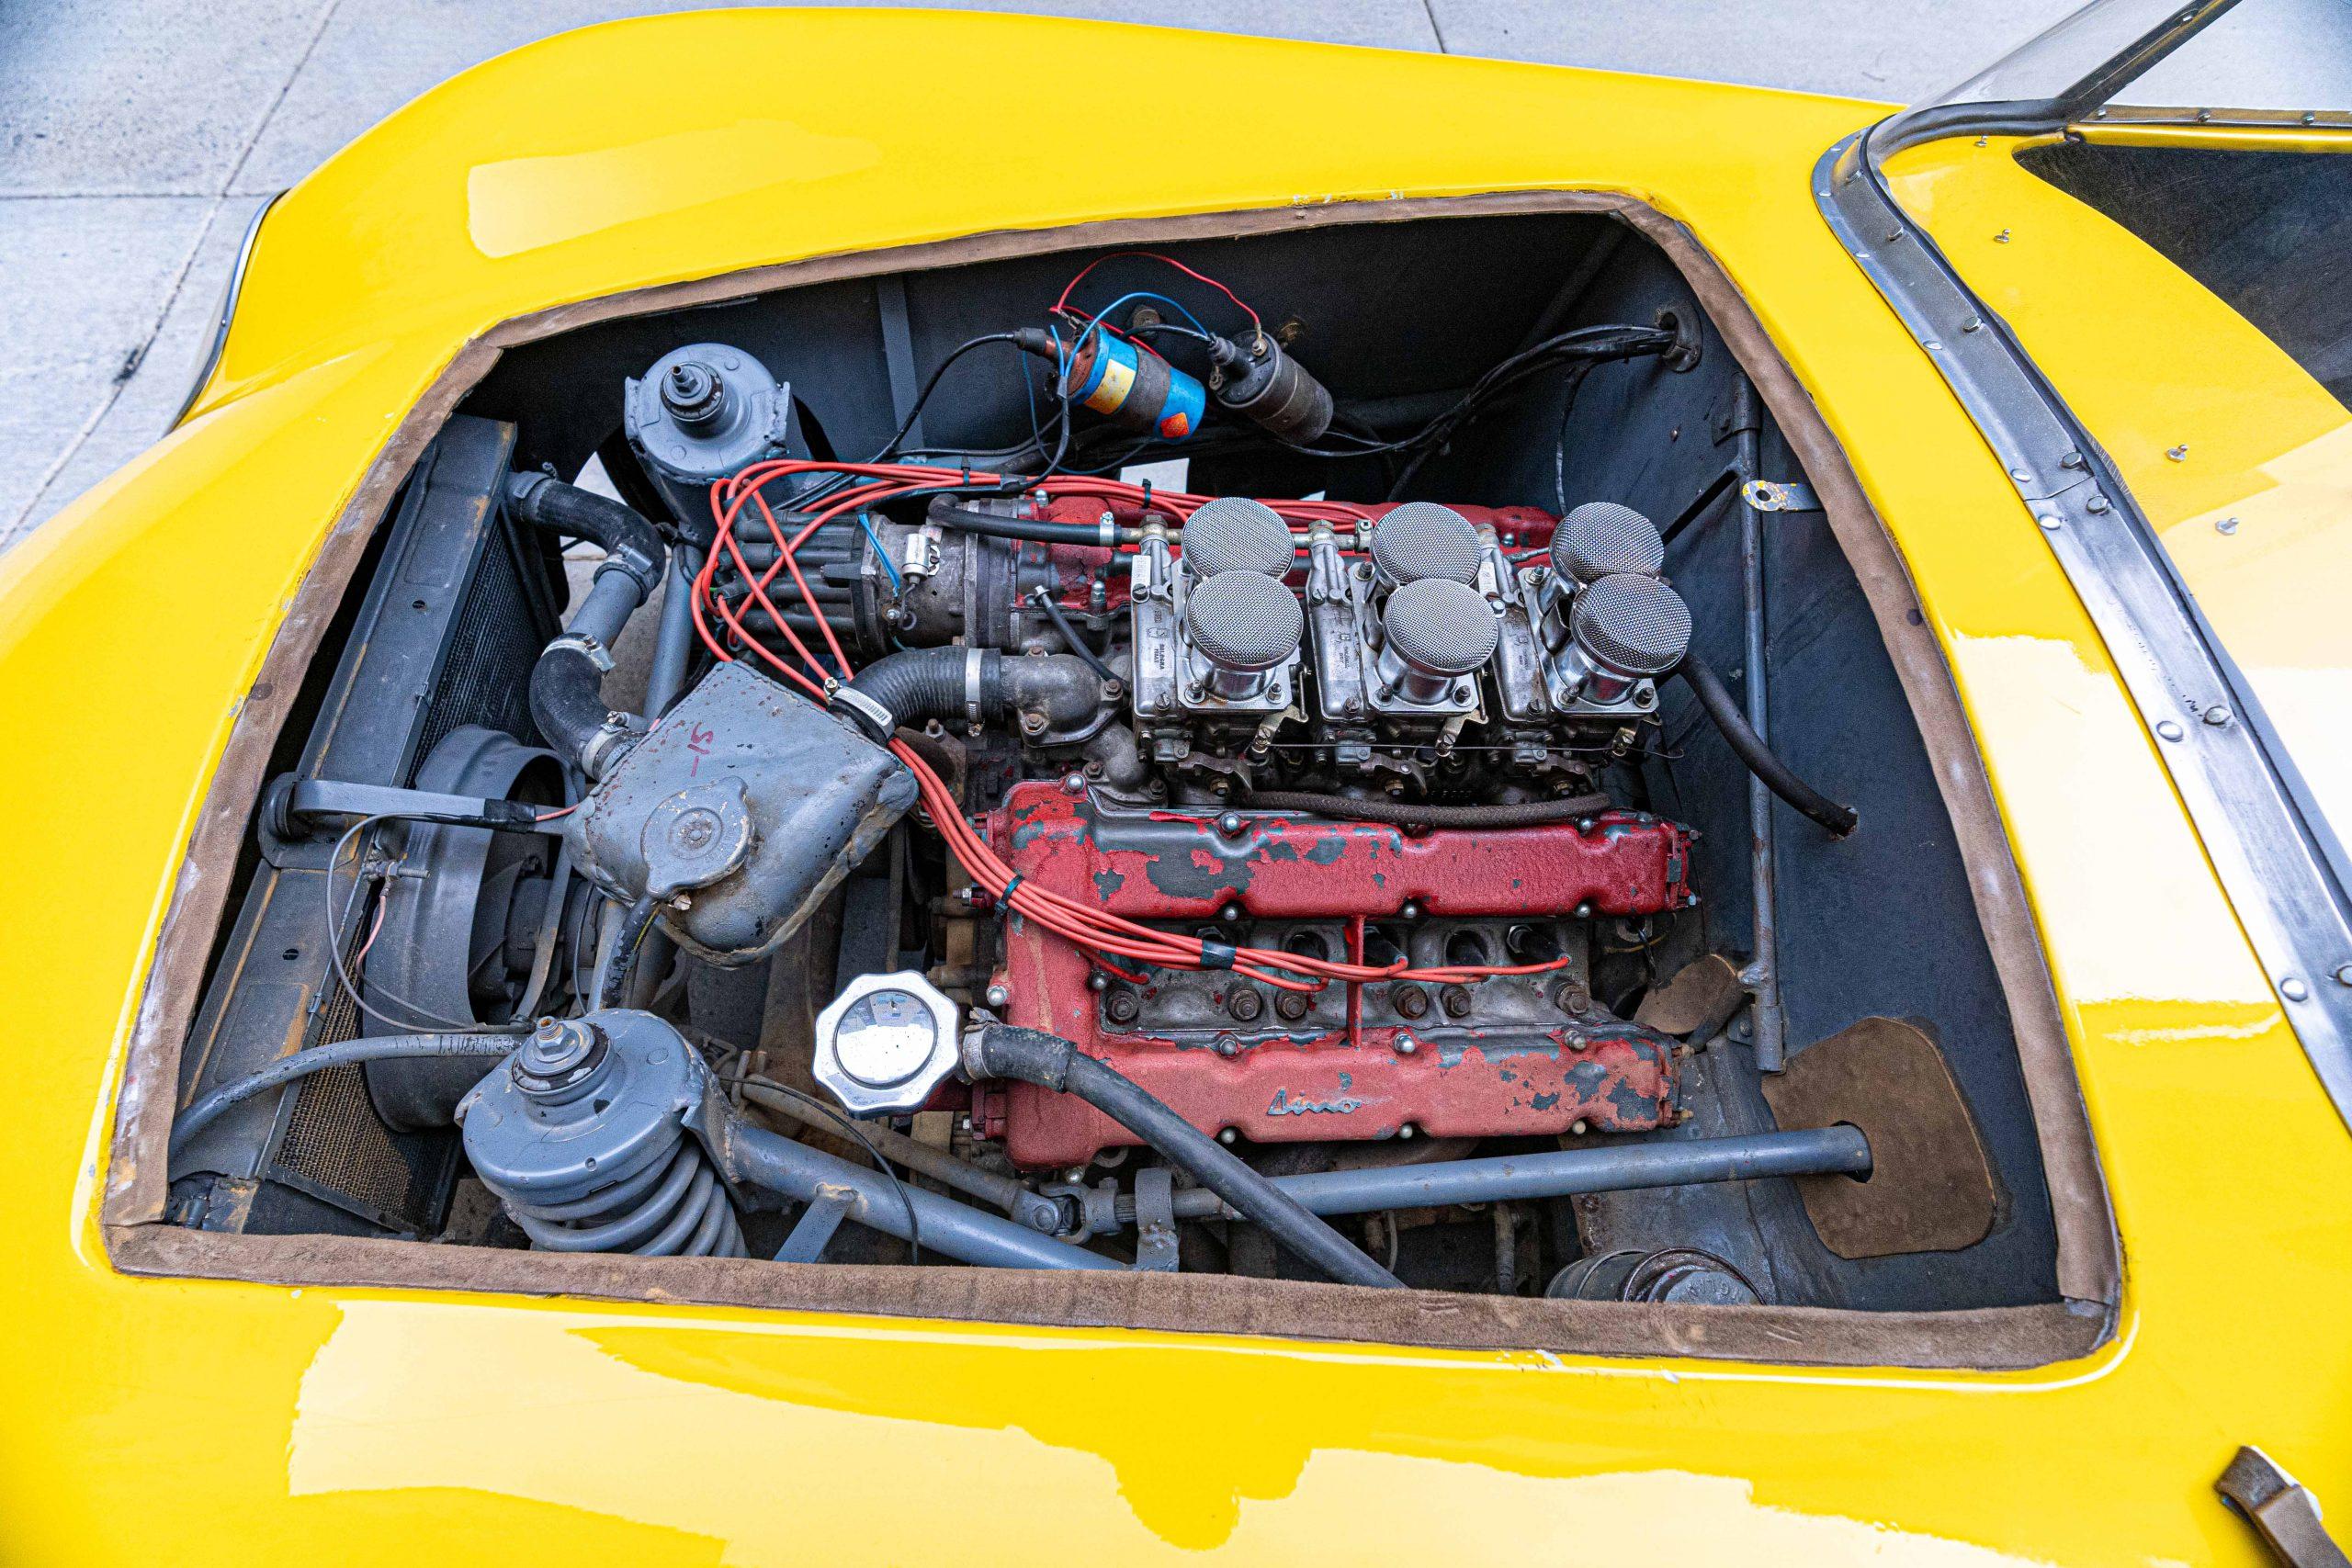 1957 Ferrari 196 engine driver side view